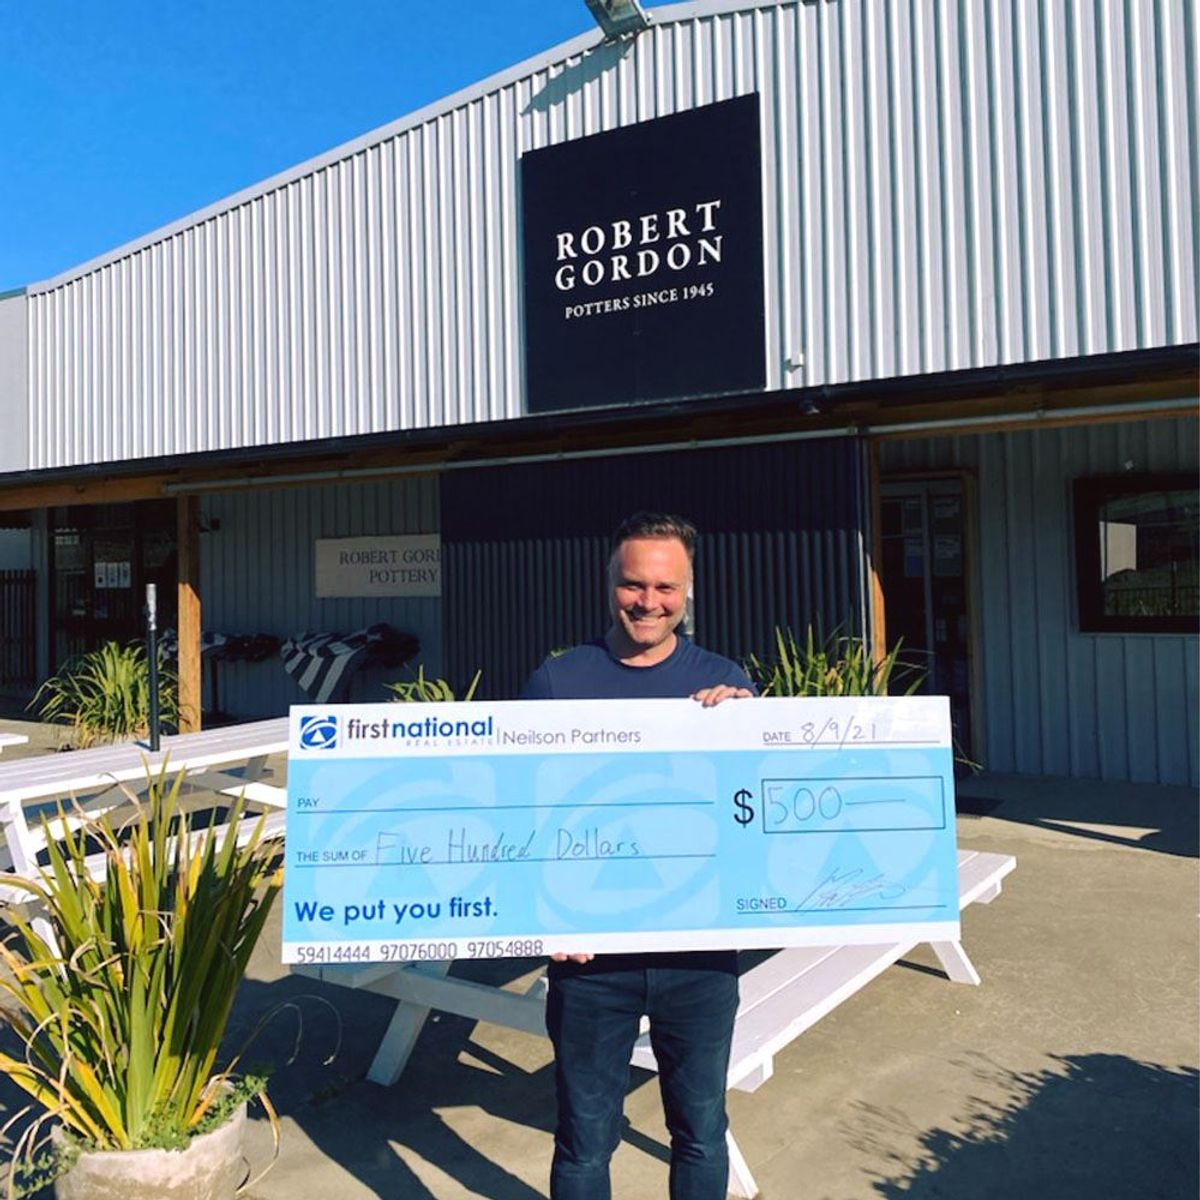 Man holding massive cheque at Robert Gordon Pottery